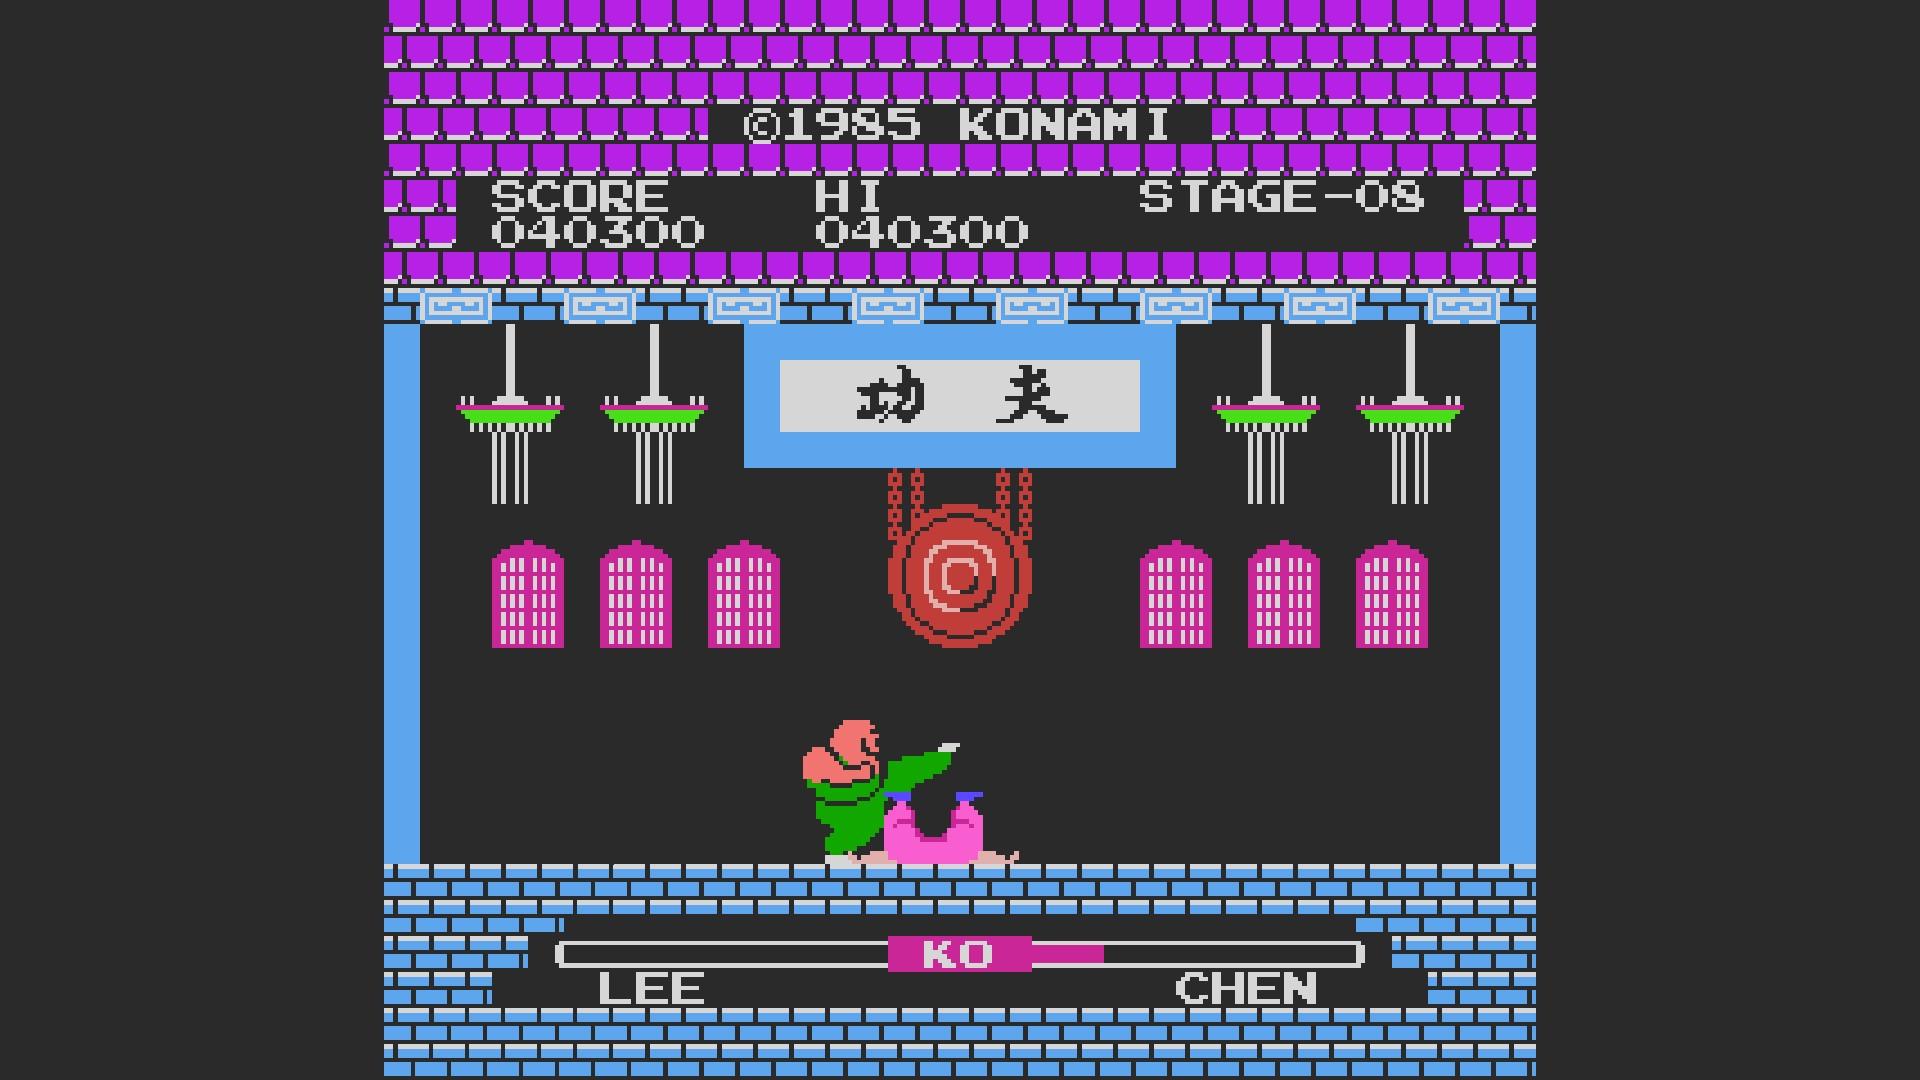 Yie Ar Kung Fu [Level 1] 40,300 points